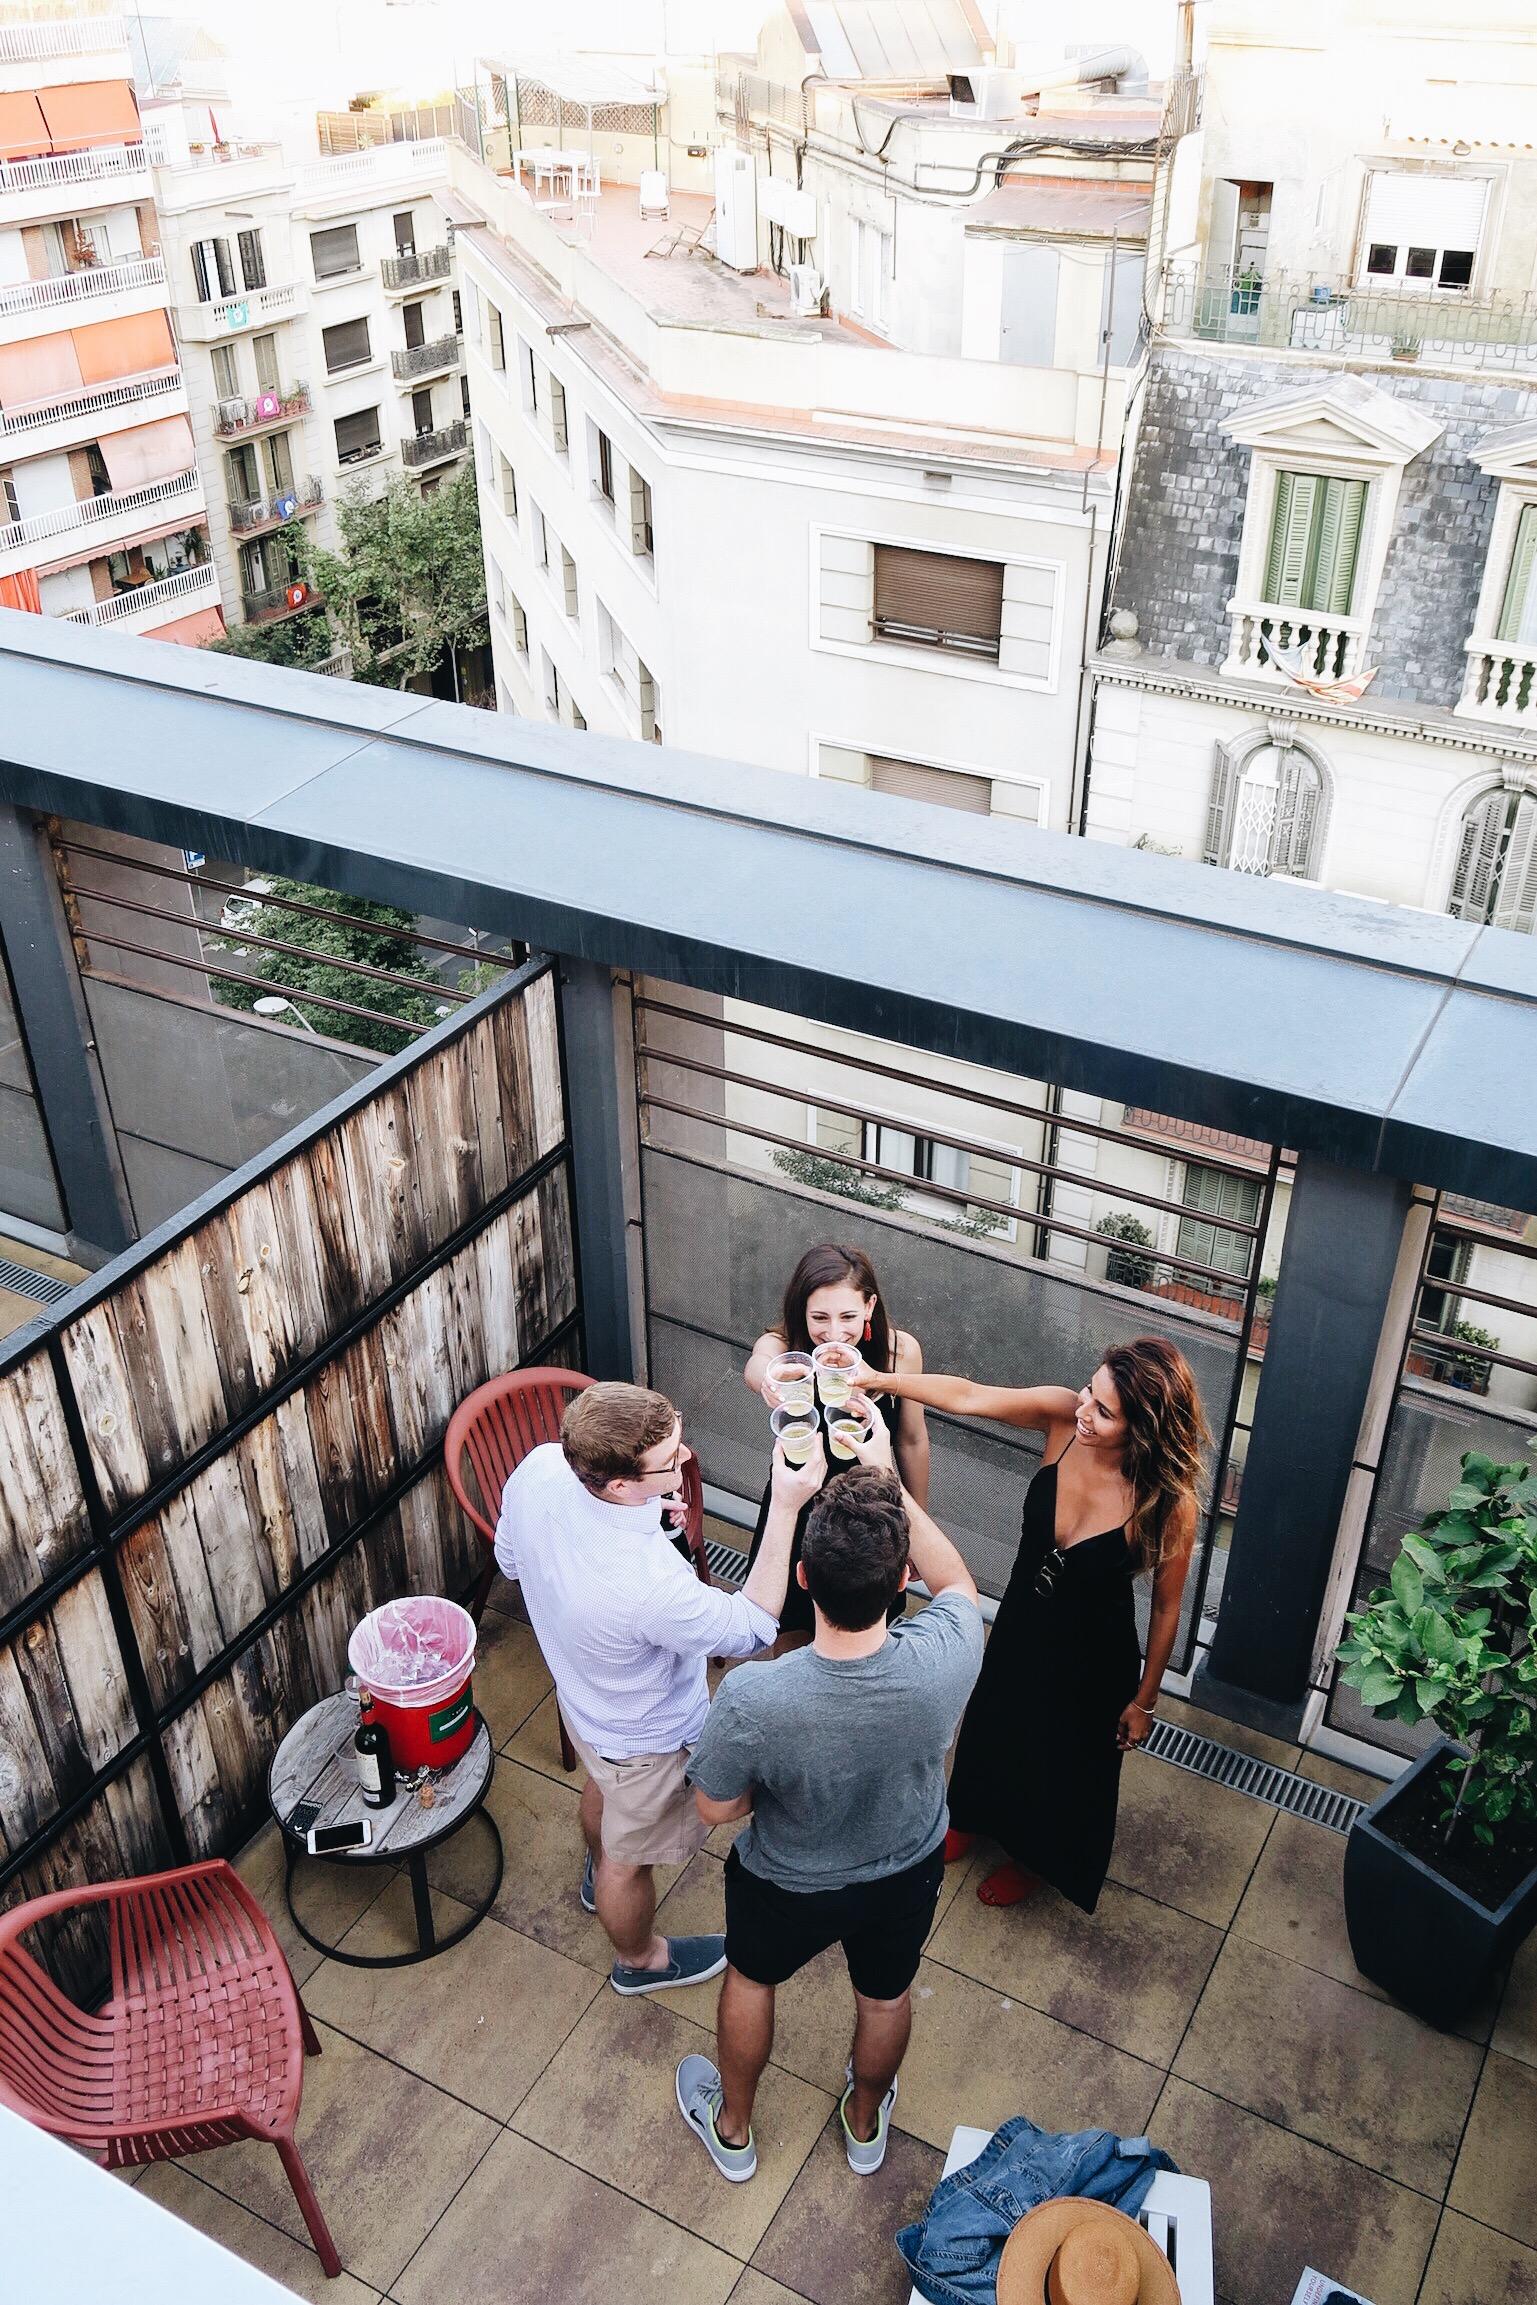 Generator Barcelona Balcony, Where to Stay in Spain